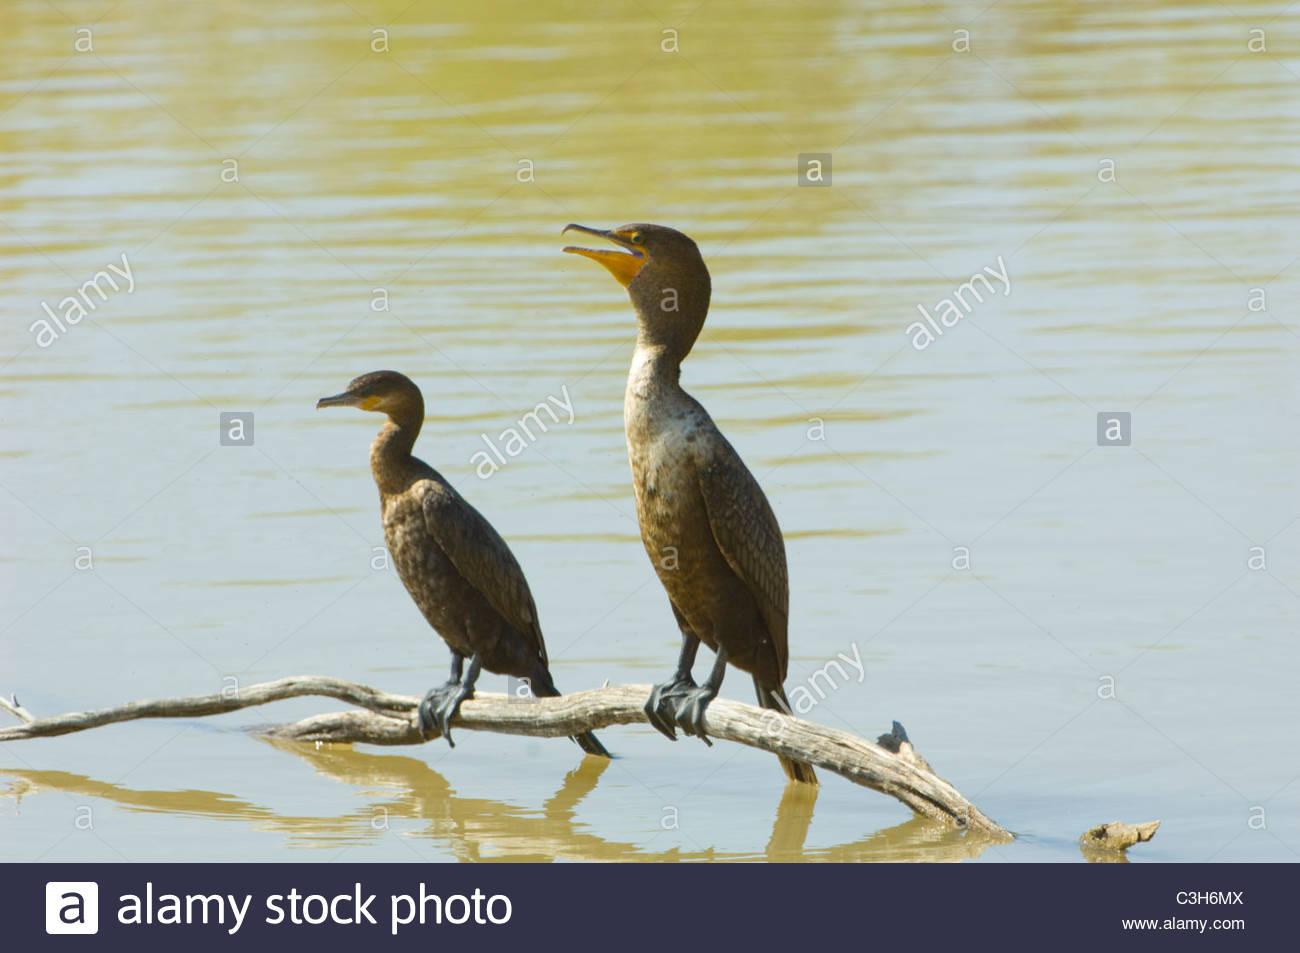 Neotropic Cormorant (Phalacrocorax brasilianus) - Stock Image